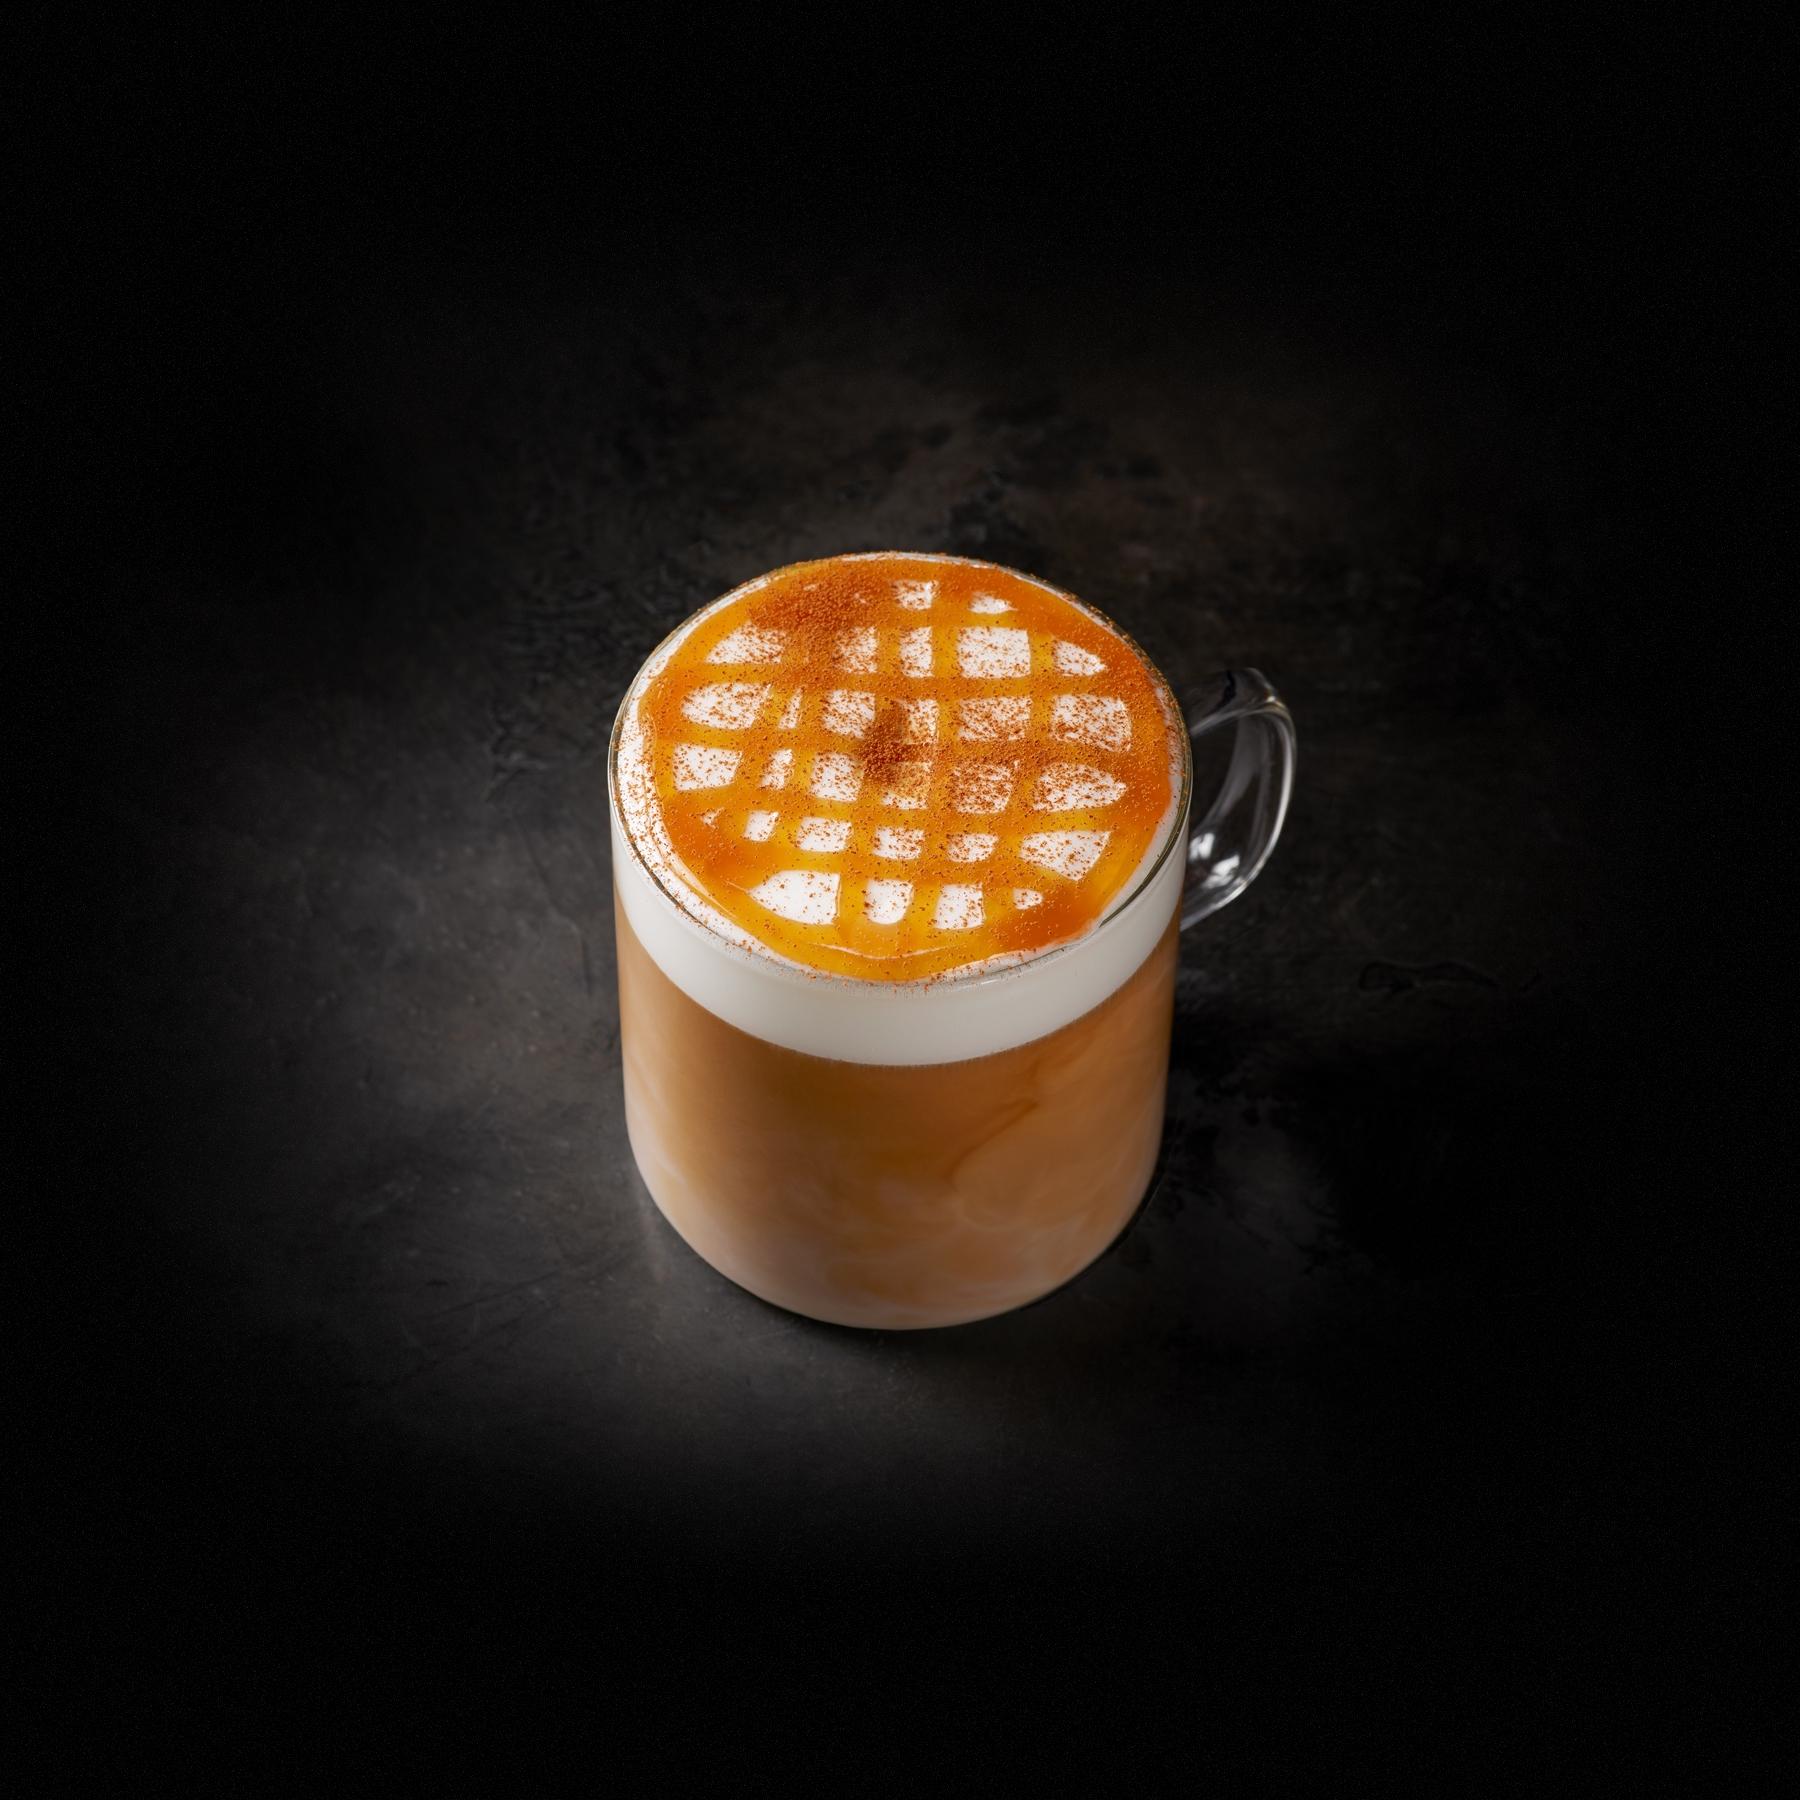 Starbucks 174 Blonde Cinnamon Cloud Macchiato Starbucks